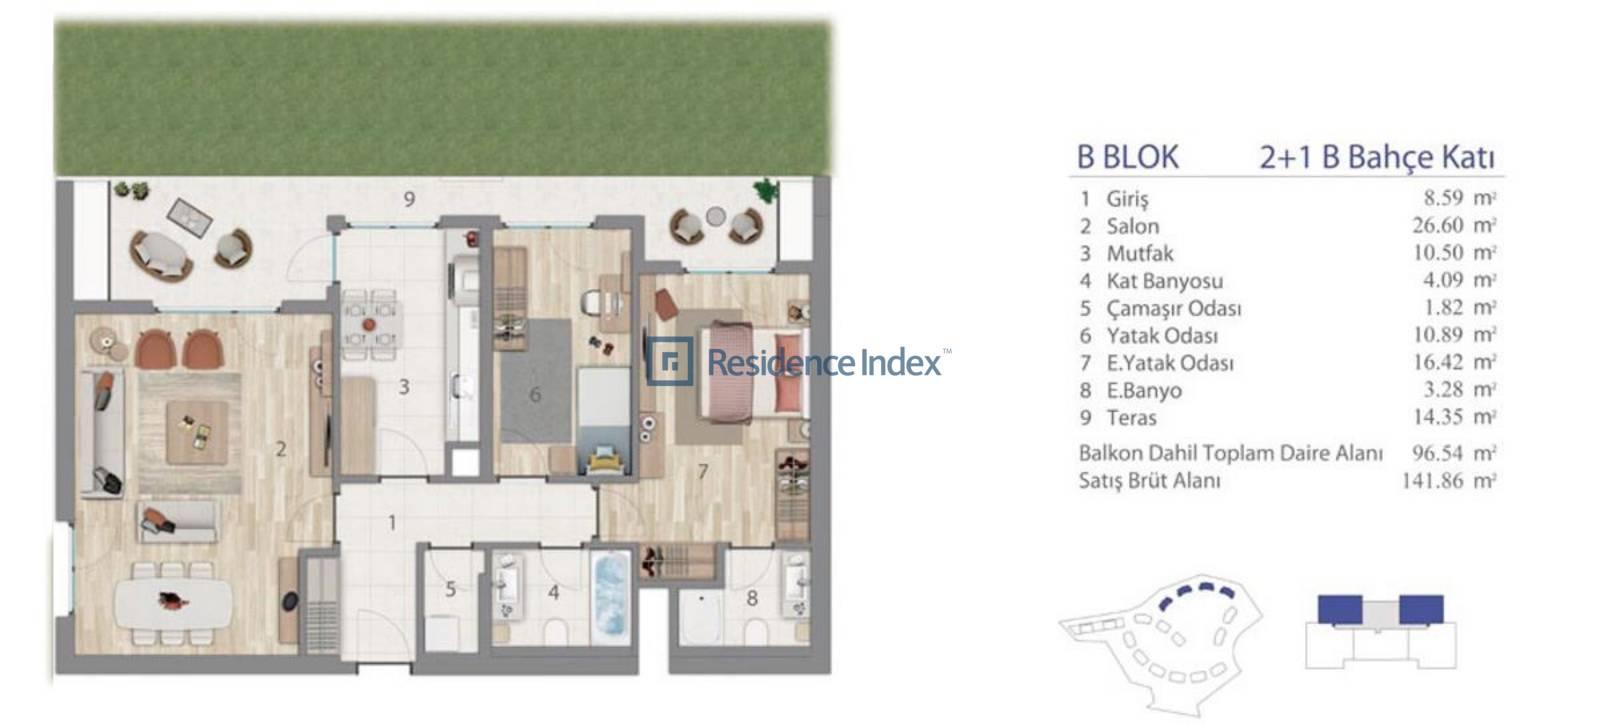 5.LEVENT B Blok Bahçe Katı B